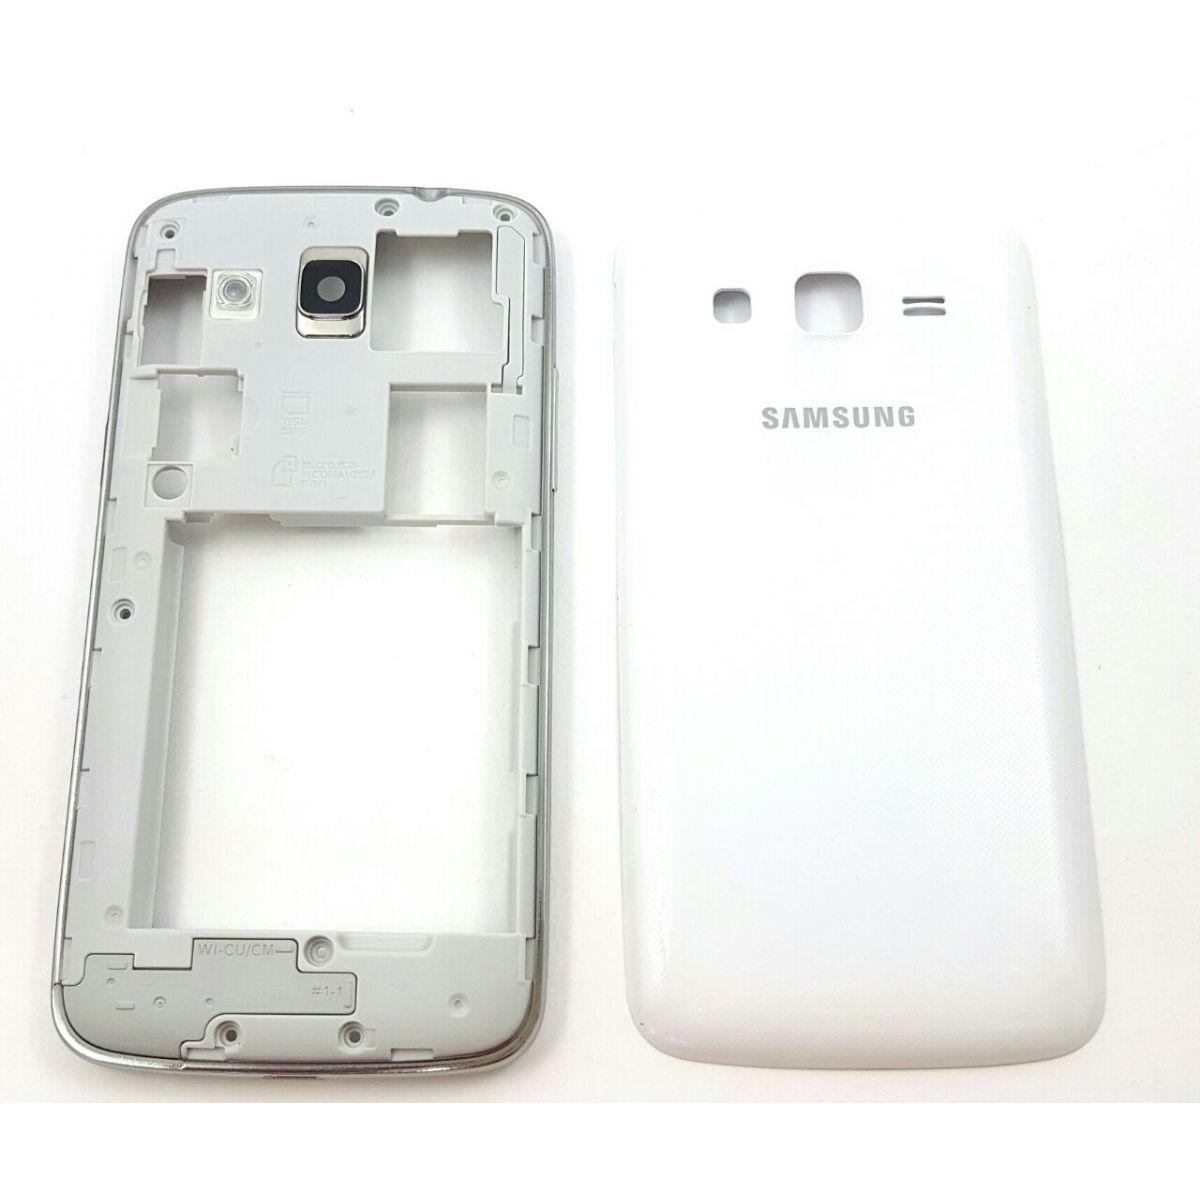 Carcaça Samsung S3 Slim SM-G3812 3812 Branco